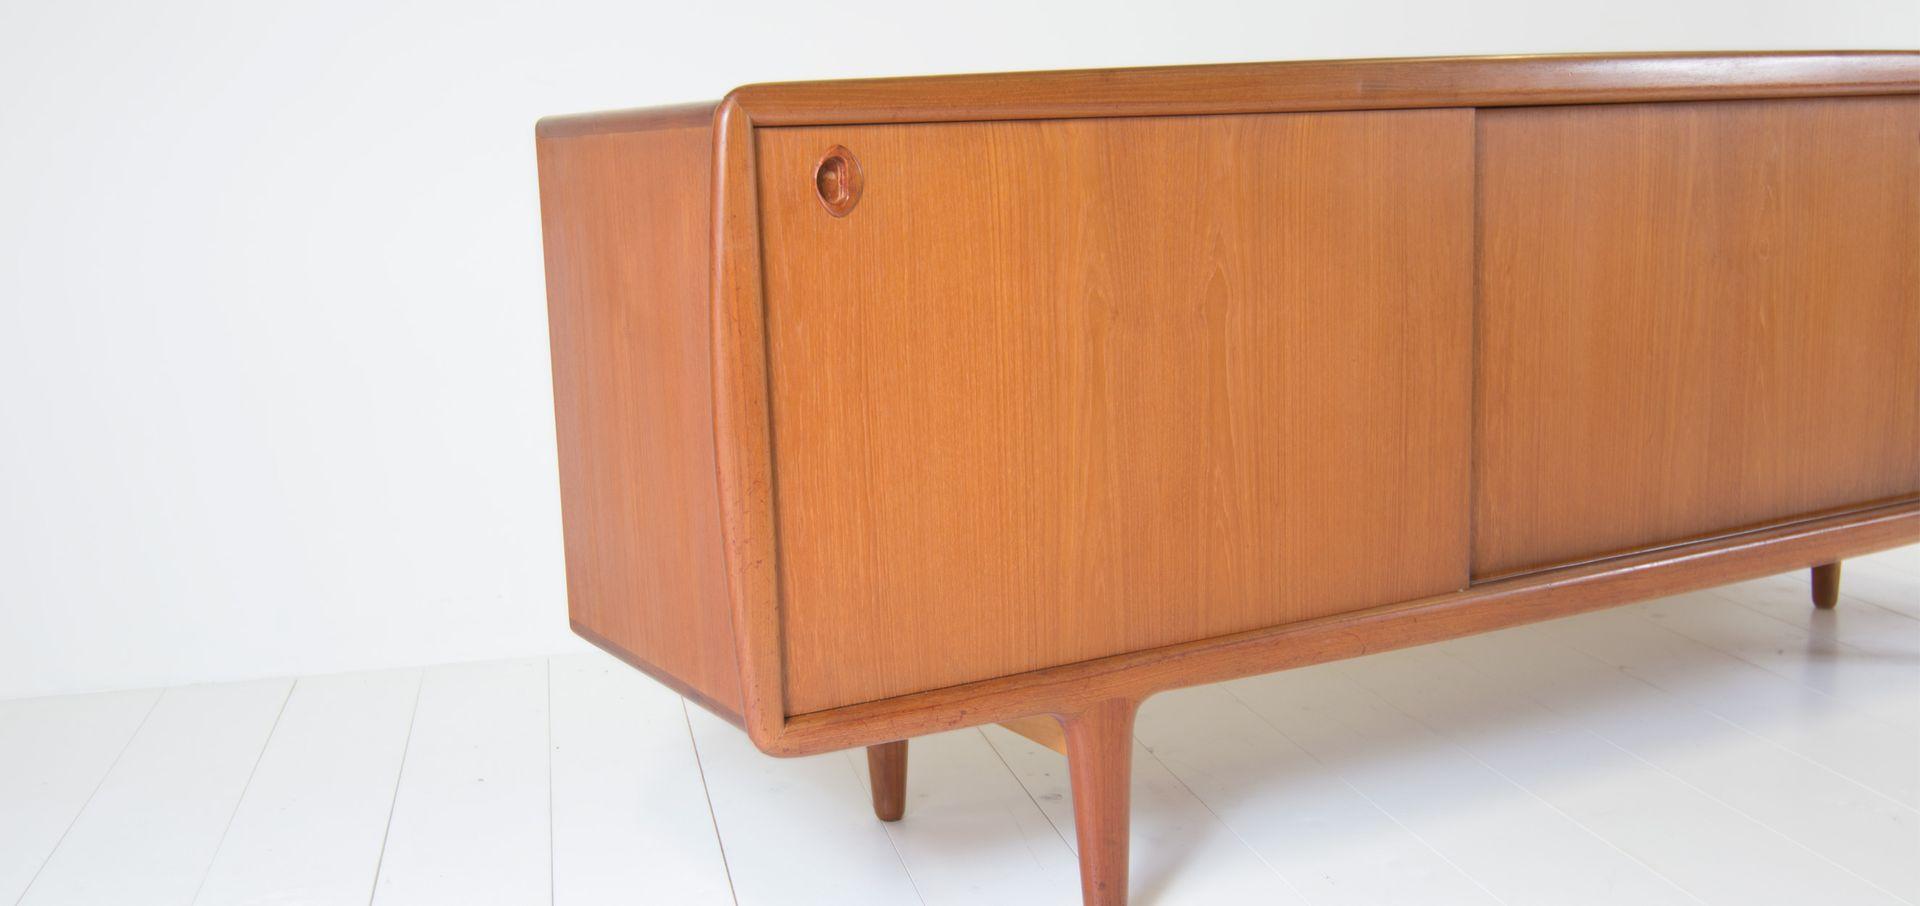 Vintage sideboard von h p hansen 1960er bei pamono kaufen for Sideboard 4 meter lang